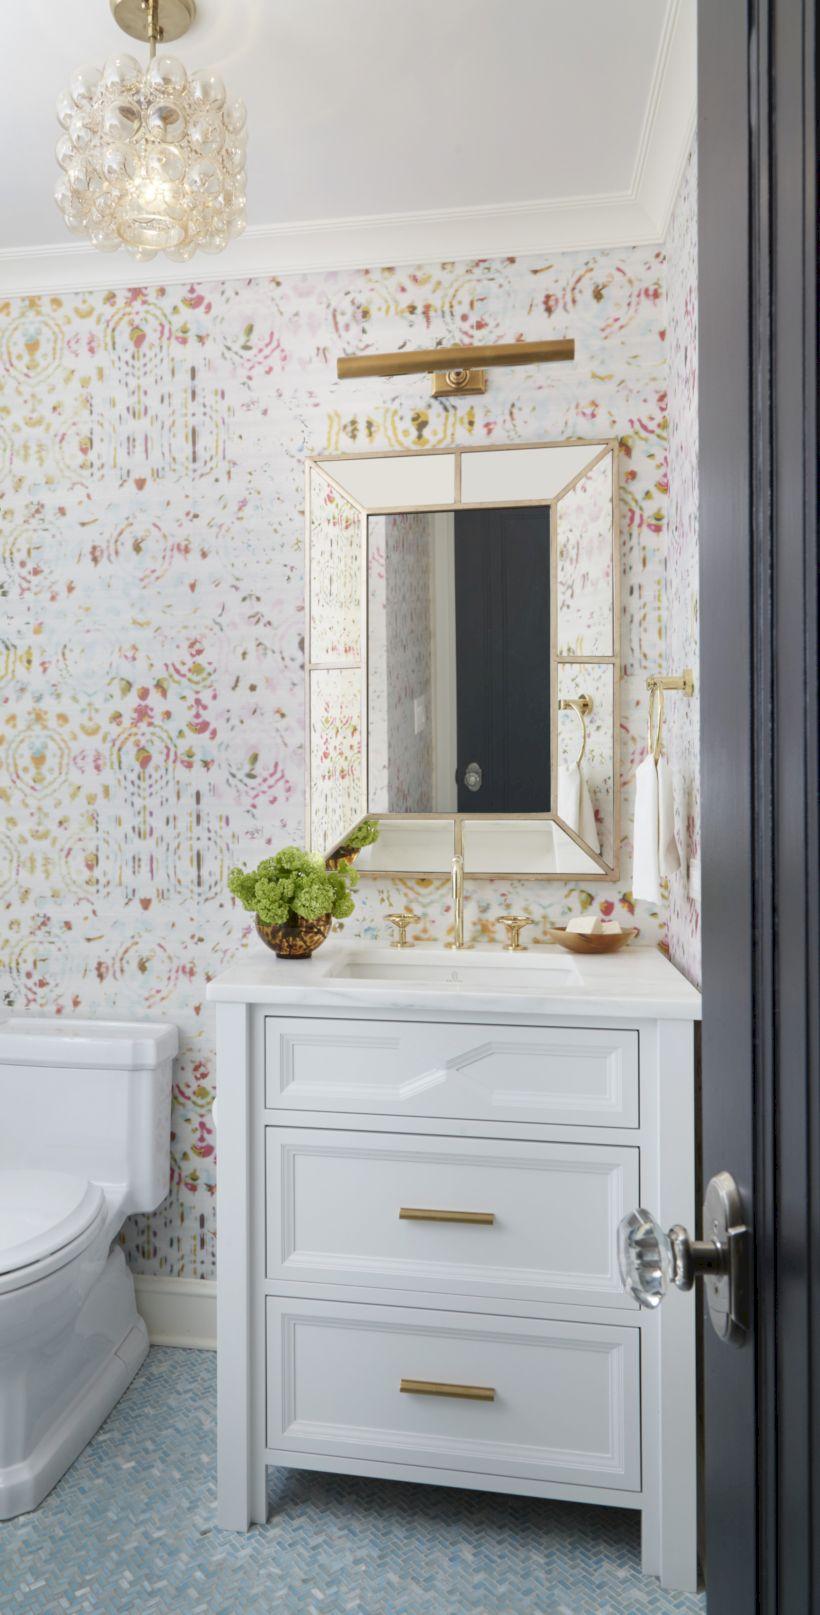 Bathroom decoration ideas for teen girls (51) - Round Decor